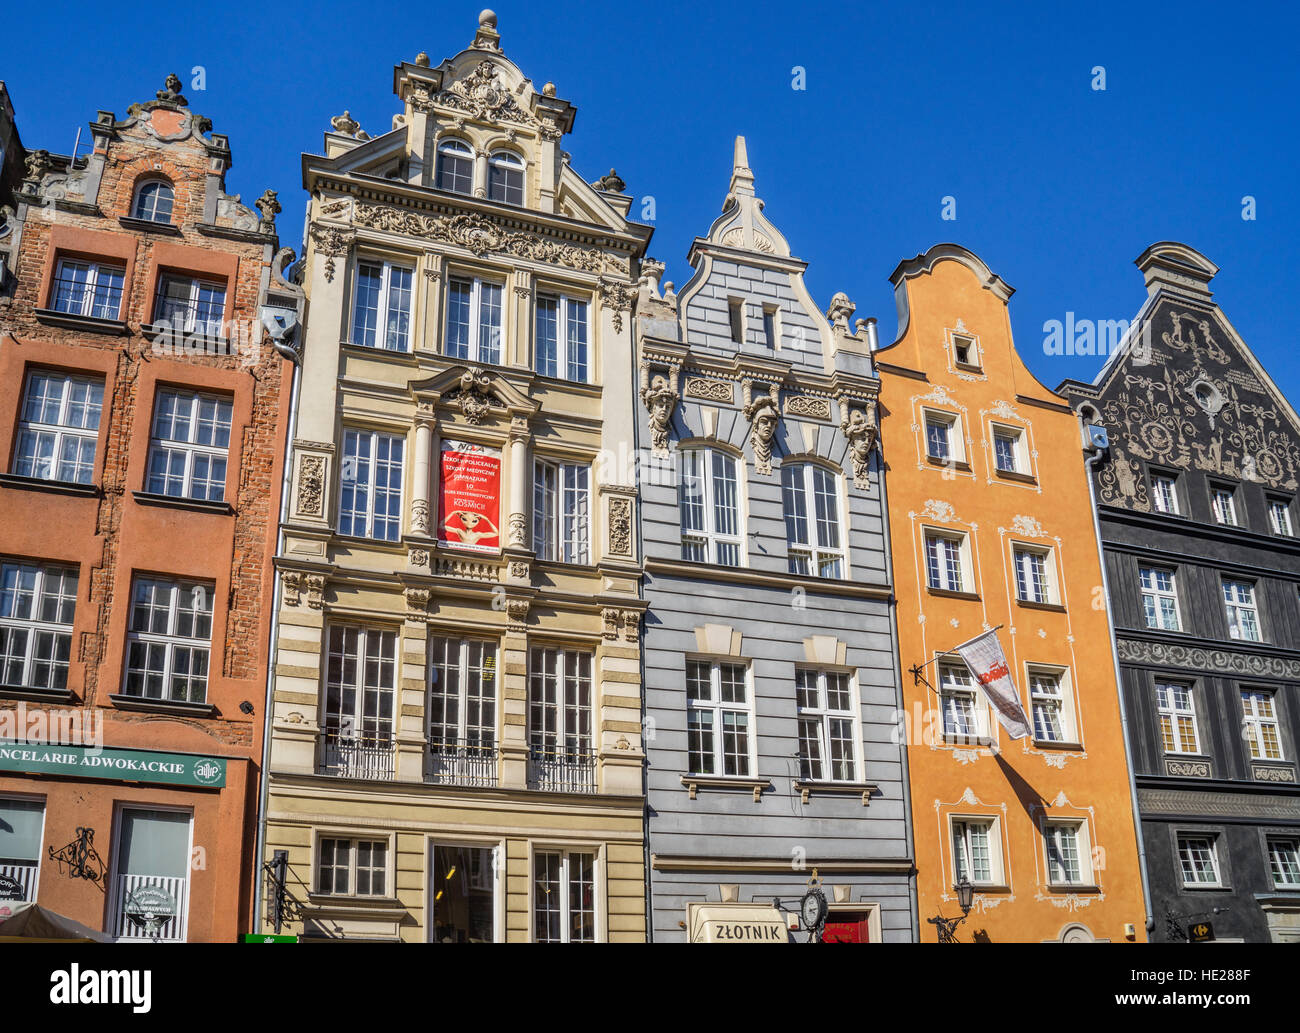 Poland, Pomerania, Gdansk (Danzig), patrician houses at Long Lane (Langgasse/ Ulica Dluga) - Stock Image